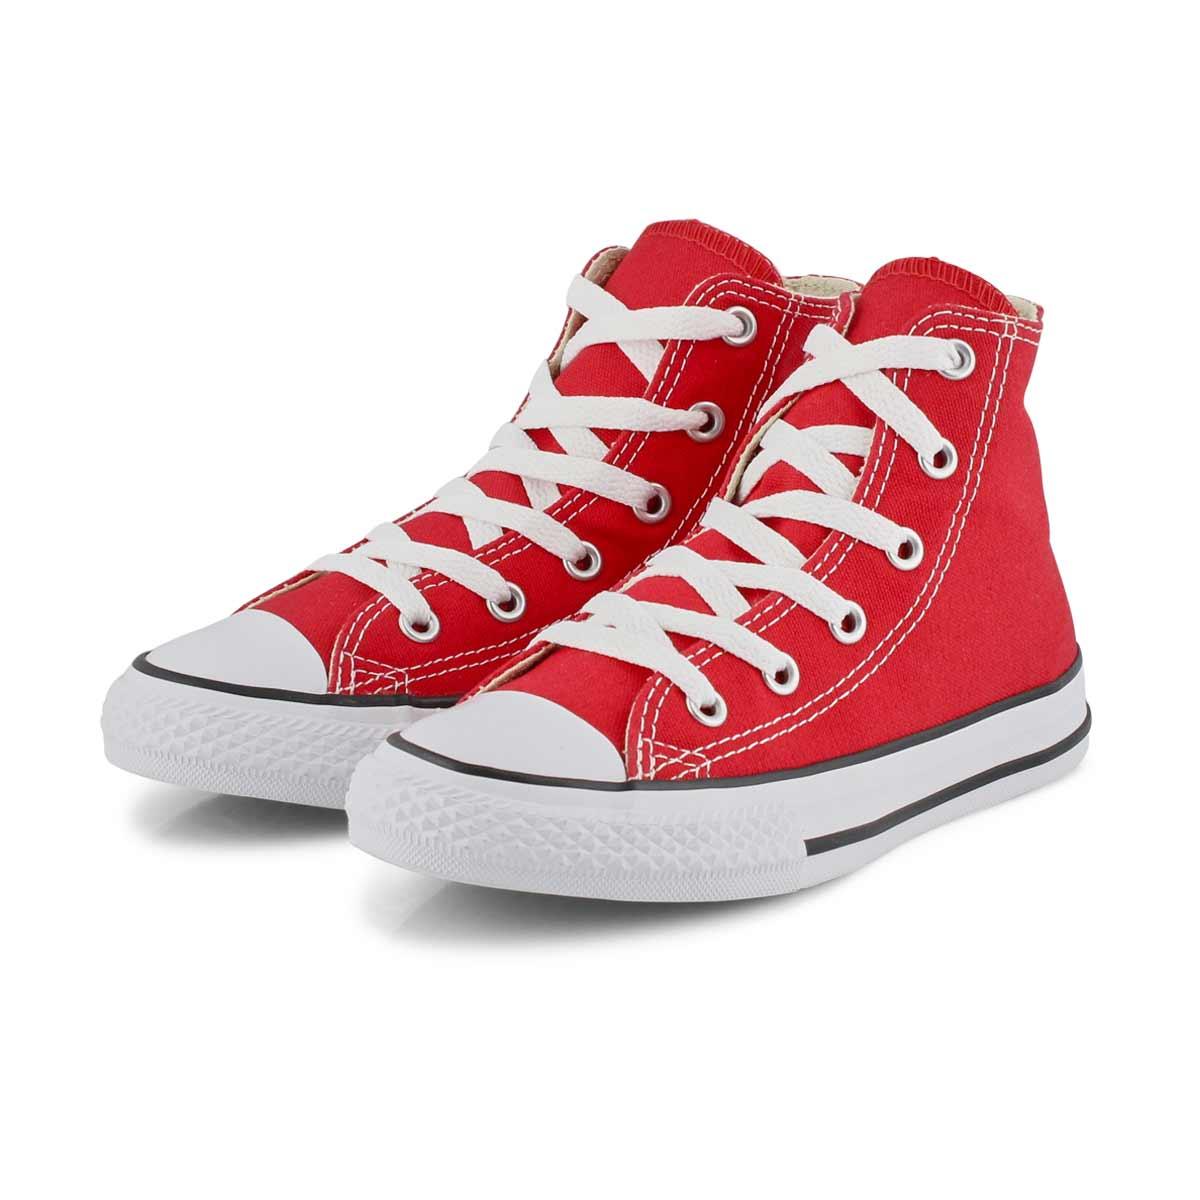 Kids' Chuck Taylor All Star Hi Top Sneaker - Red